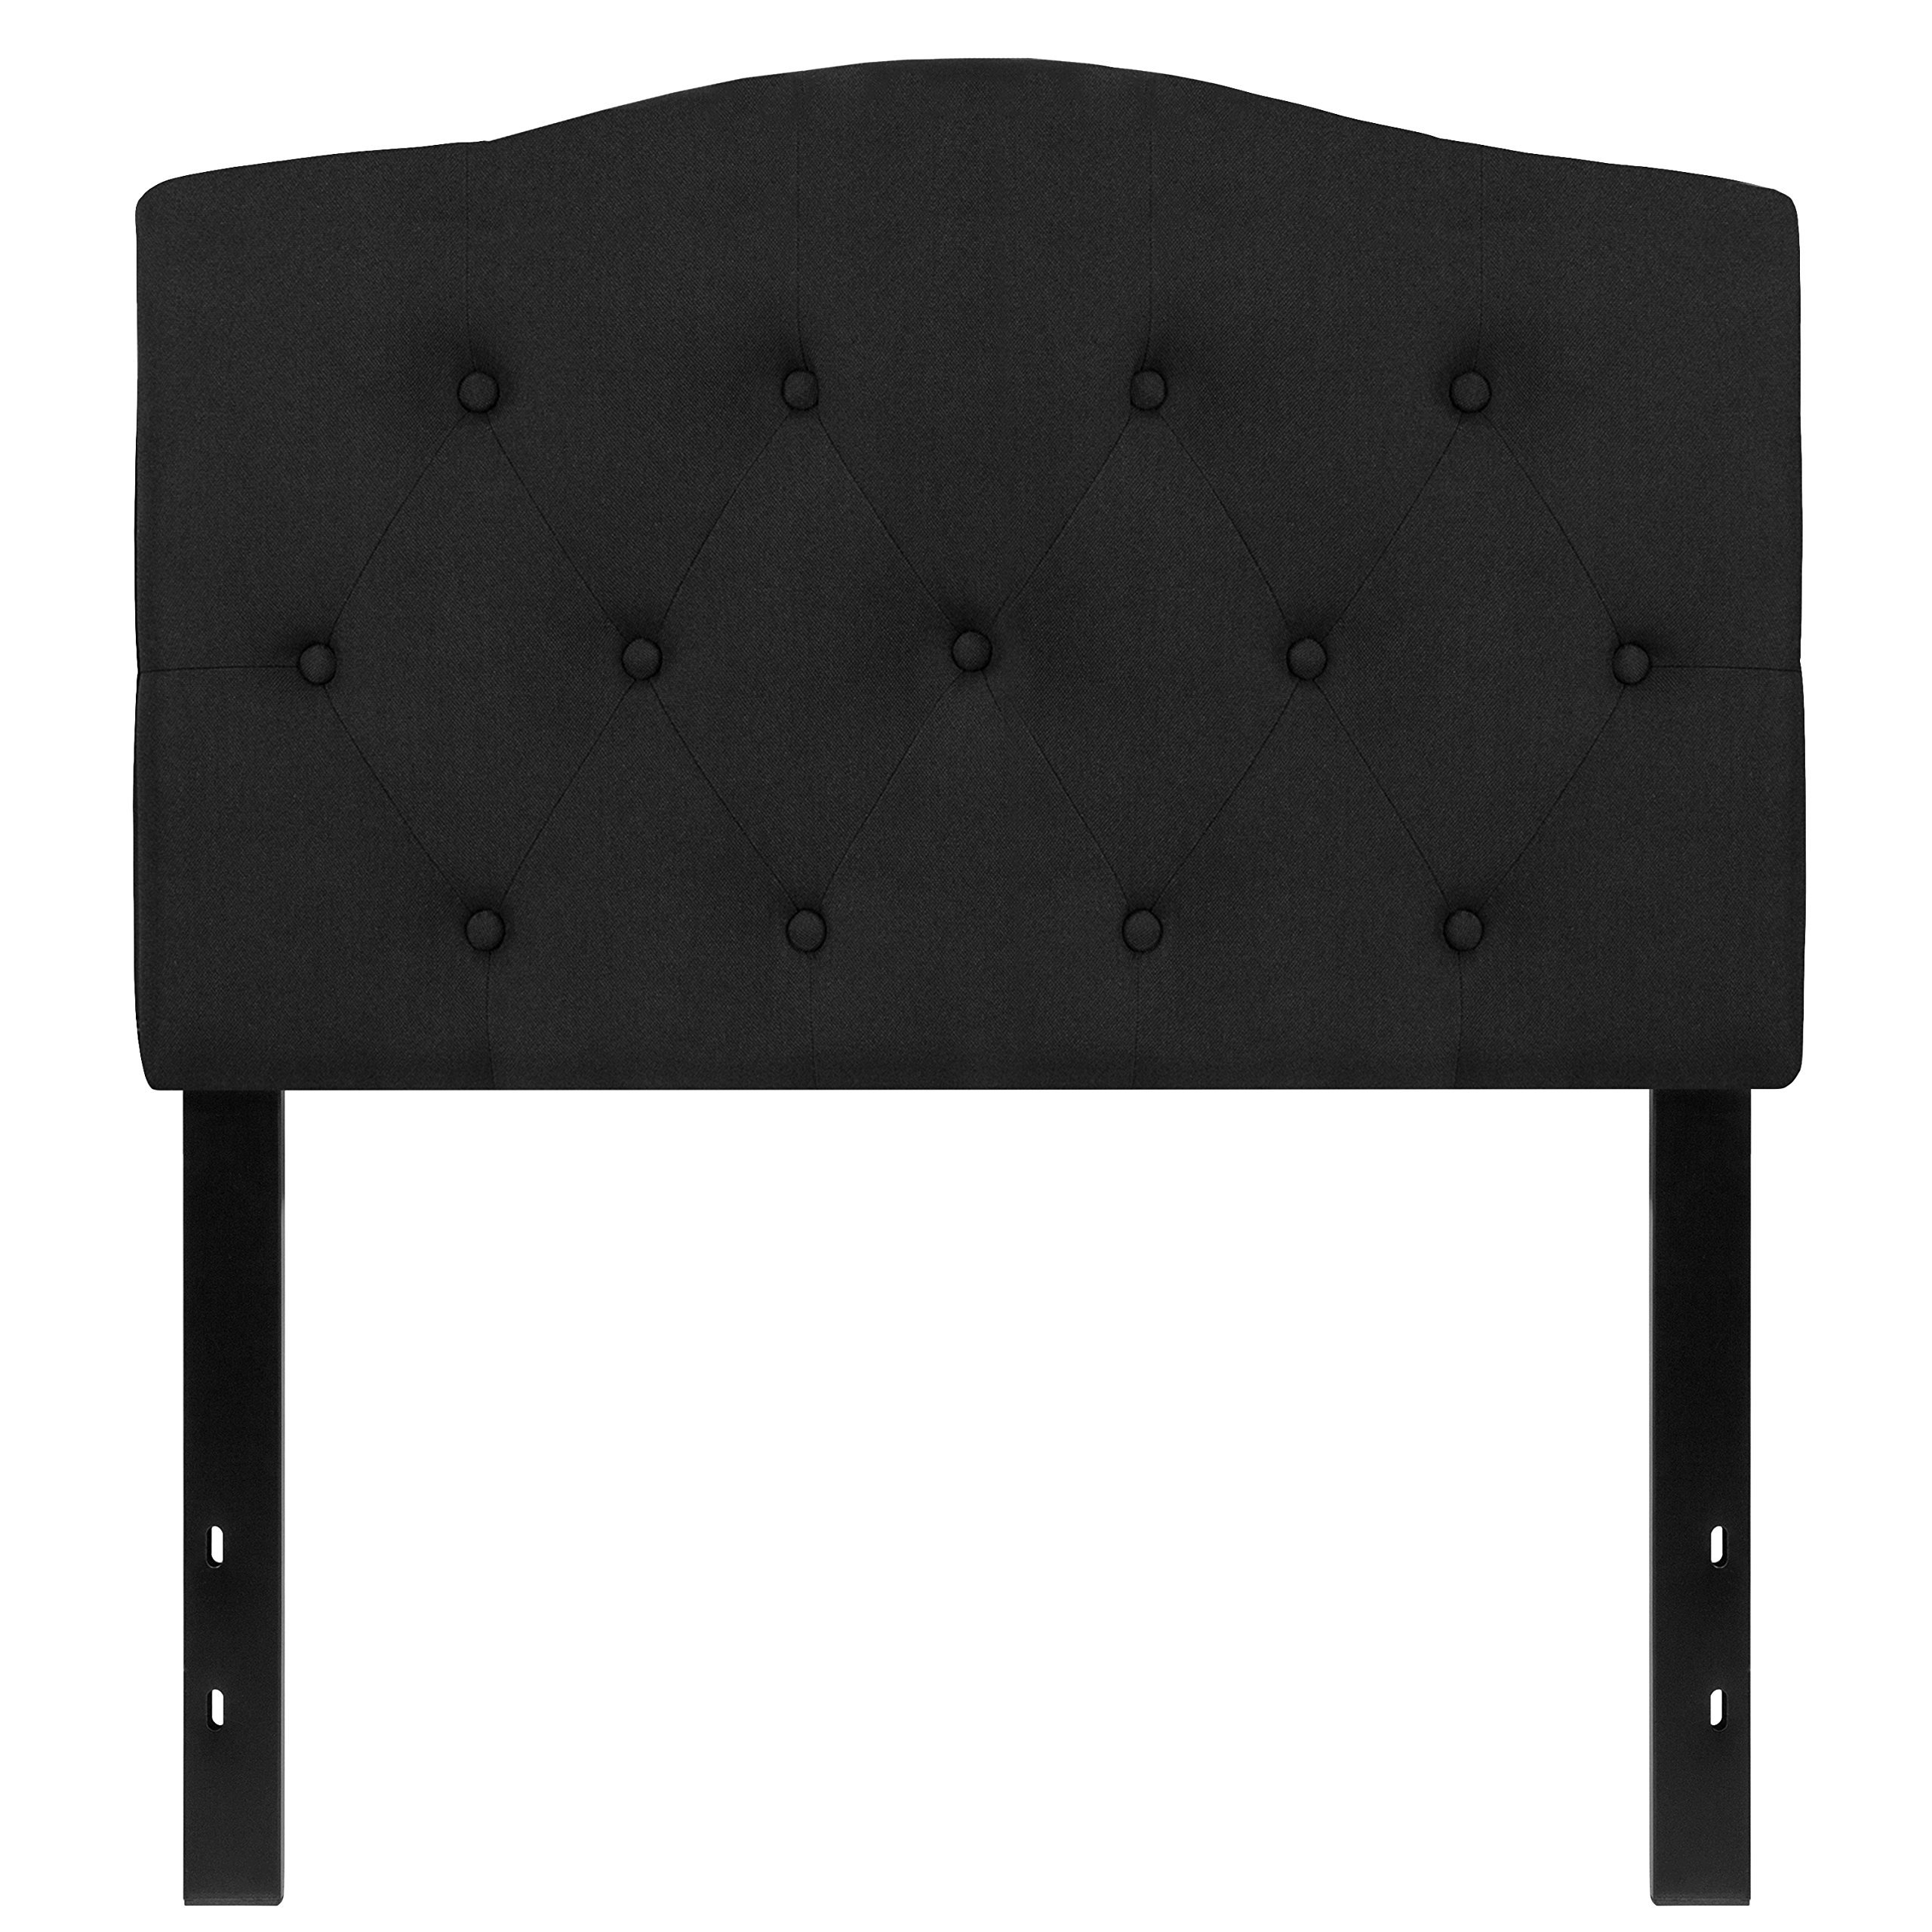 Flash Furniture Cambridge Tufted Upholstered Twin Size Headboard in Black Fabric